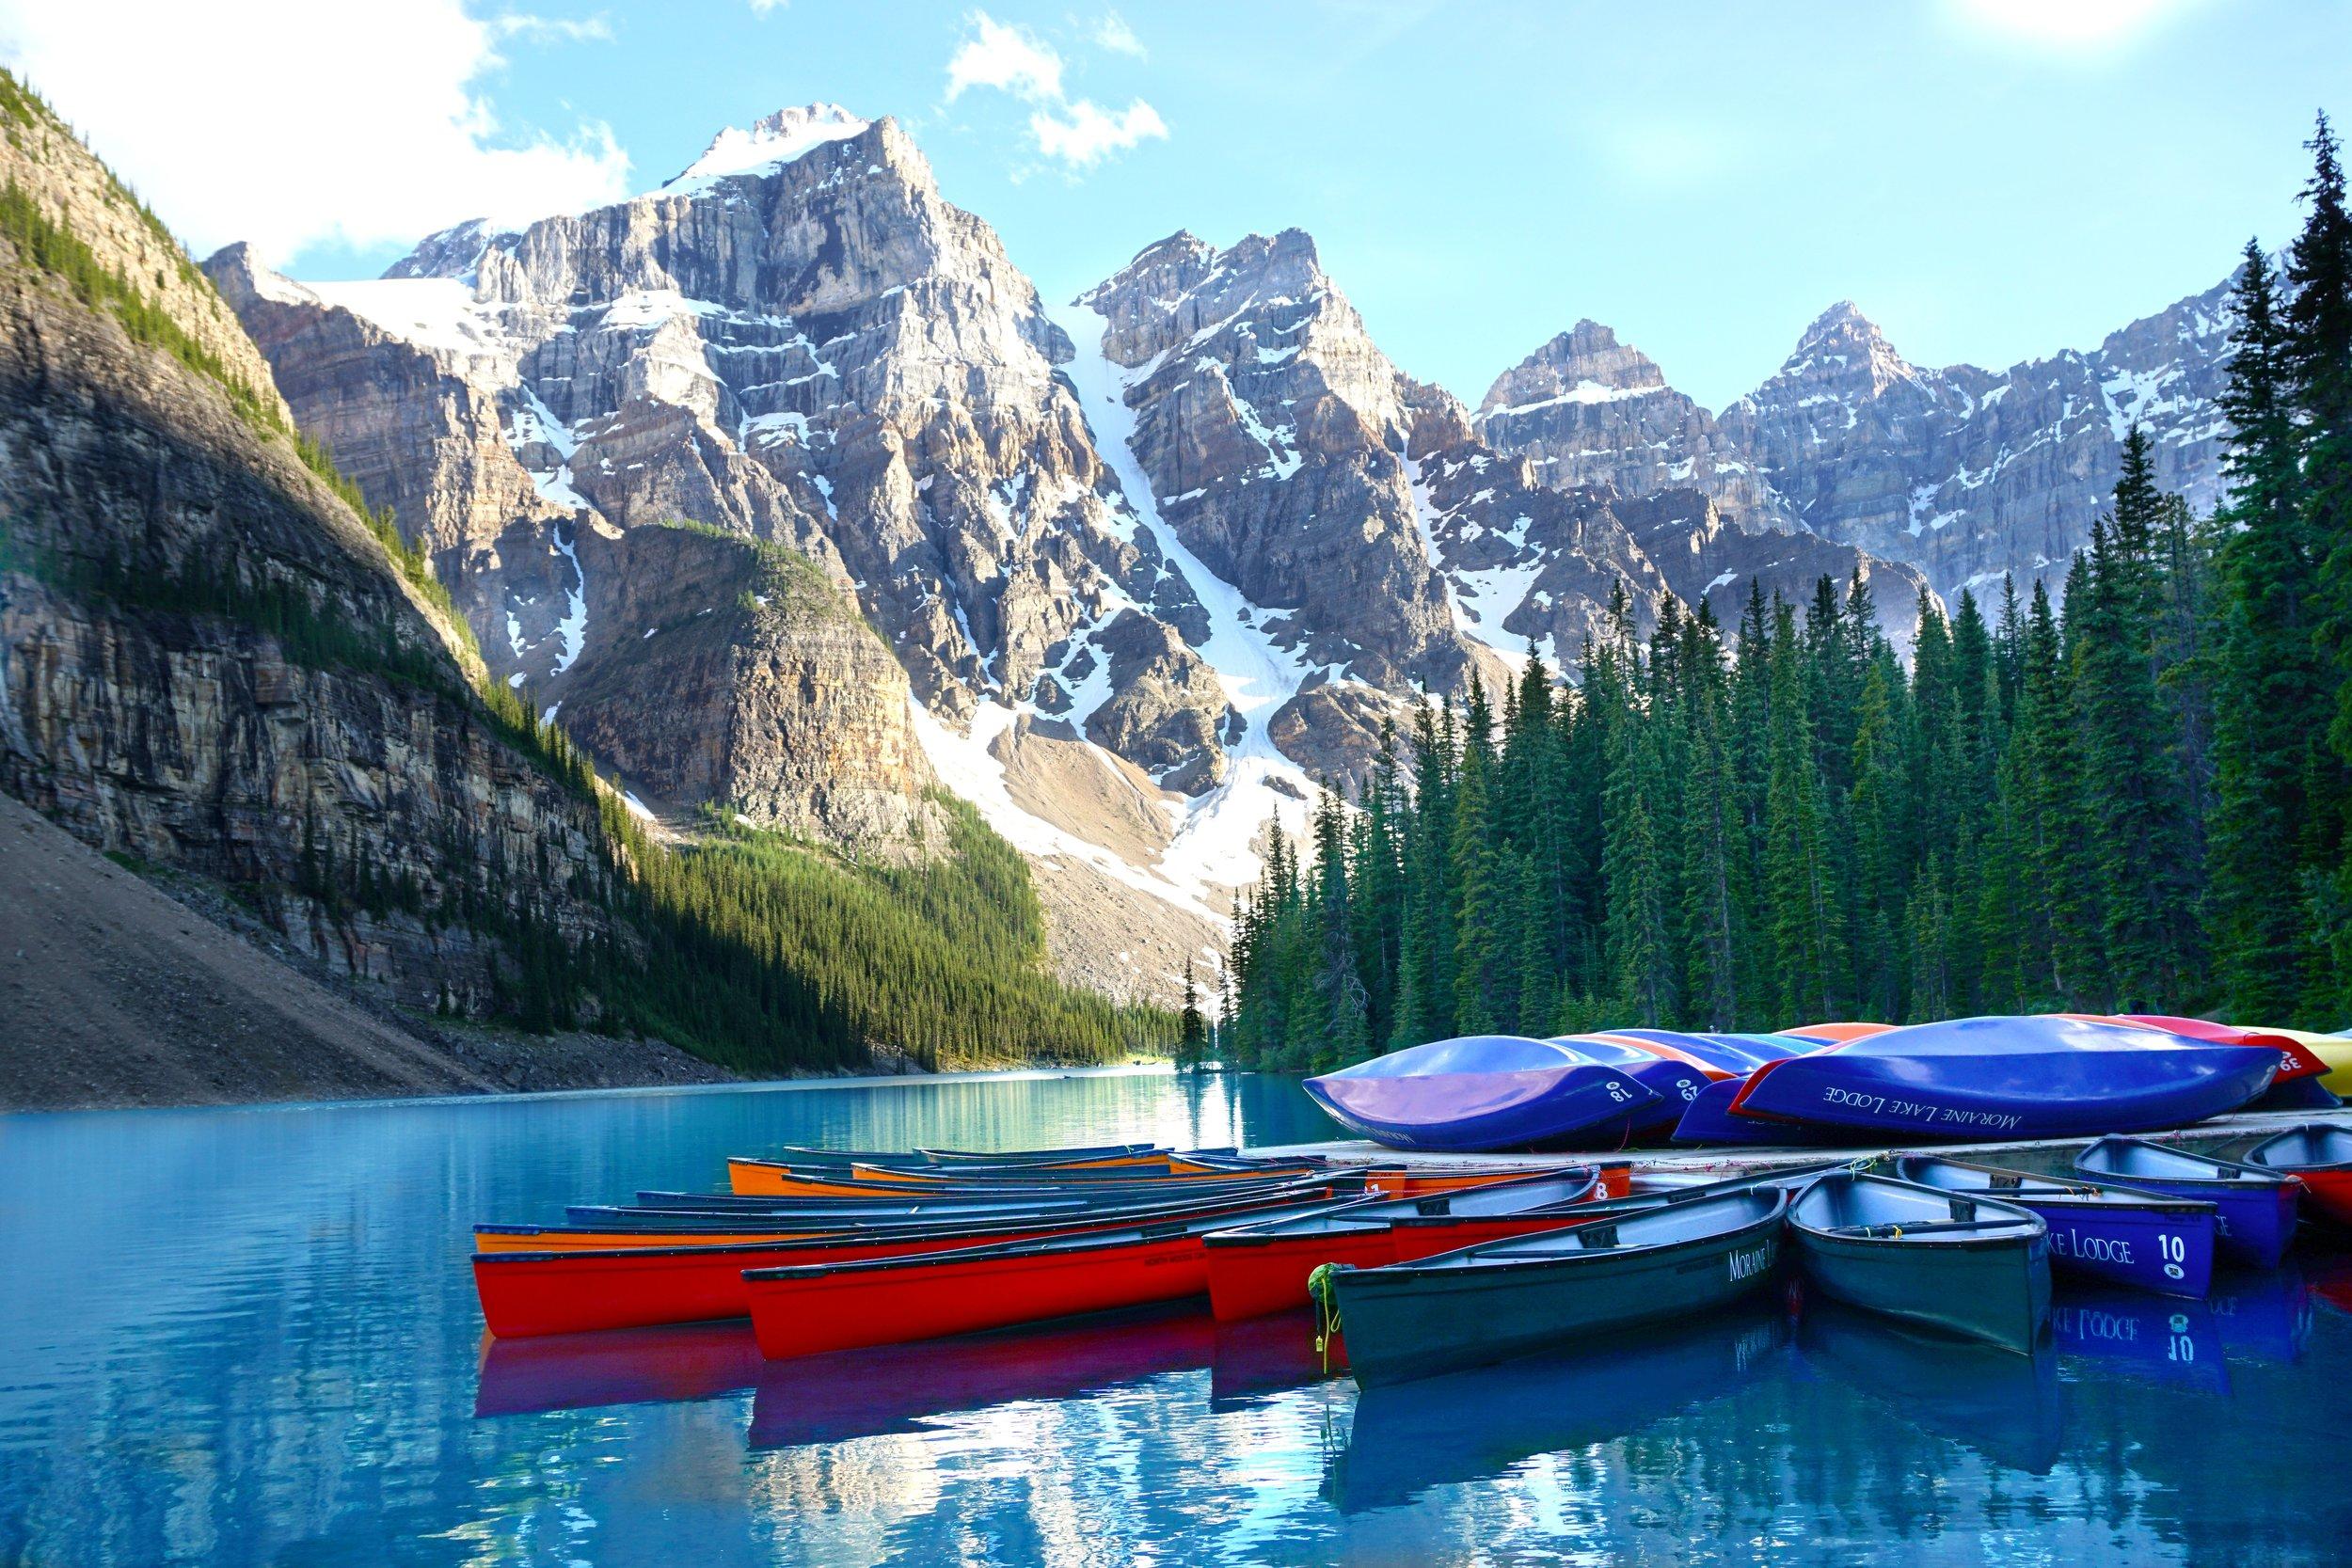 Banff National Park in Alberta Canada